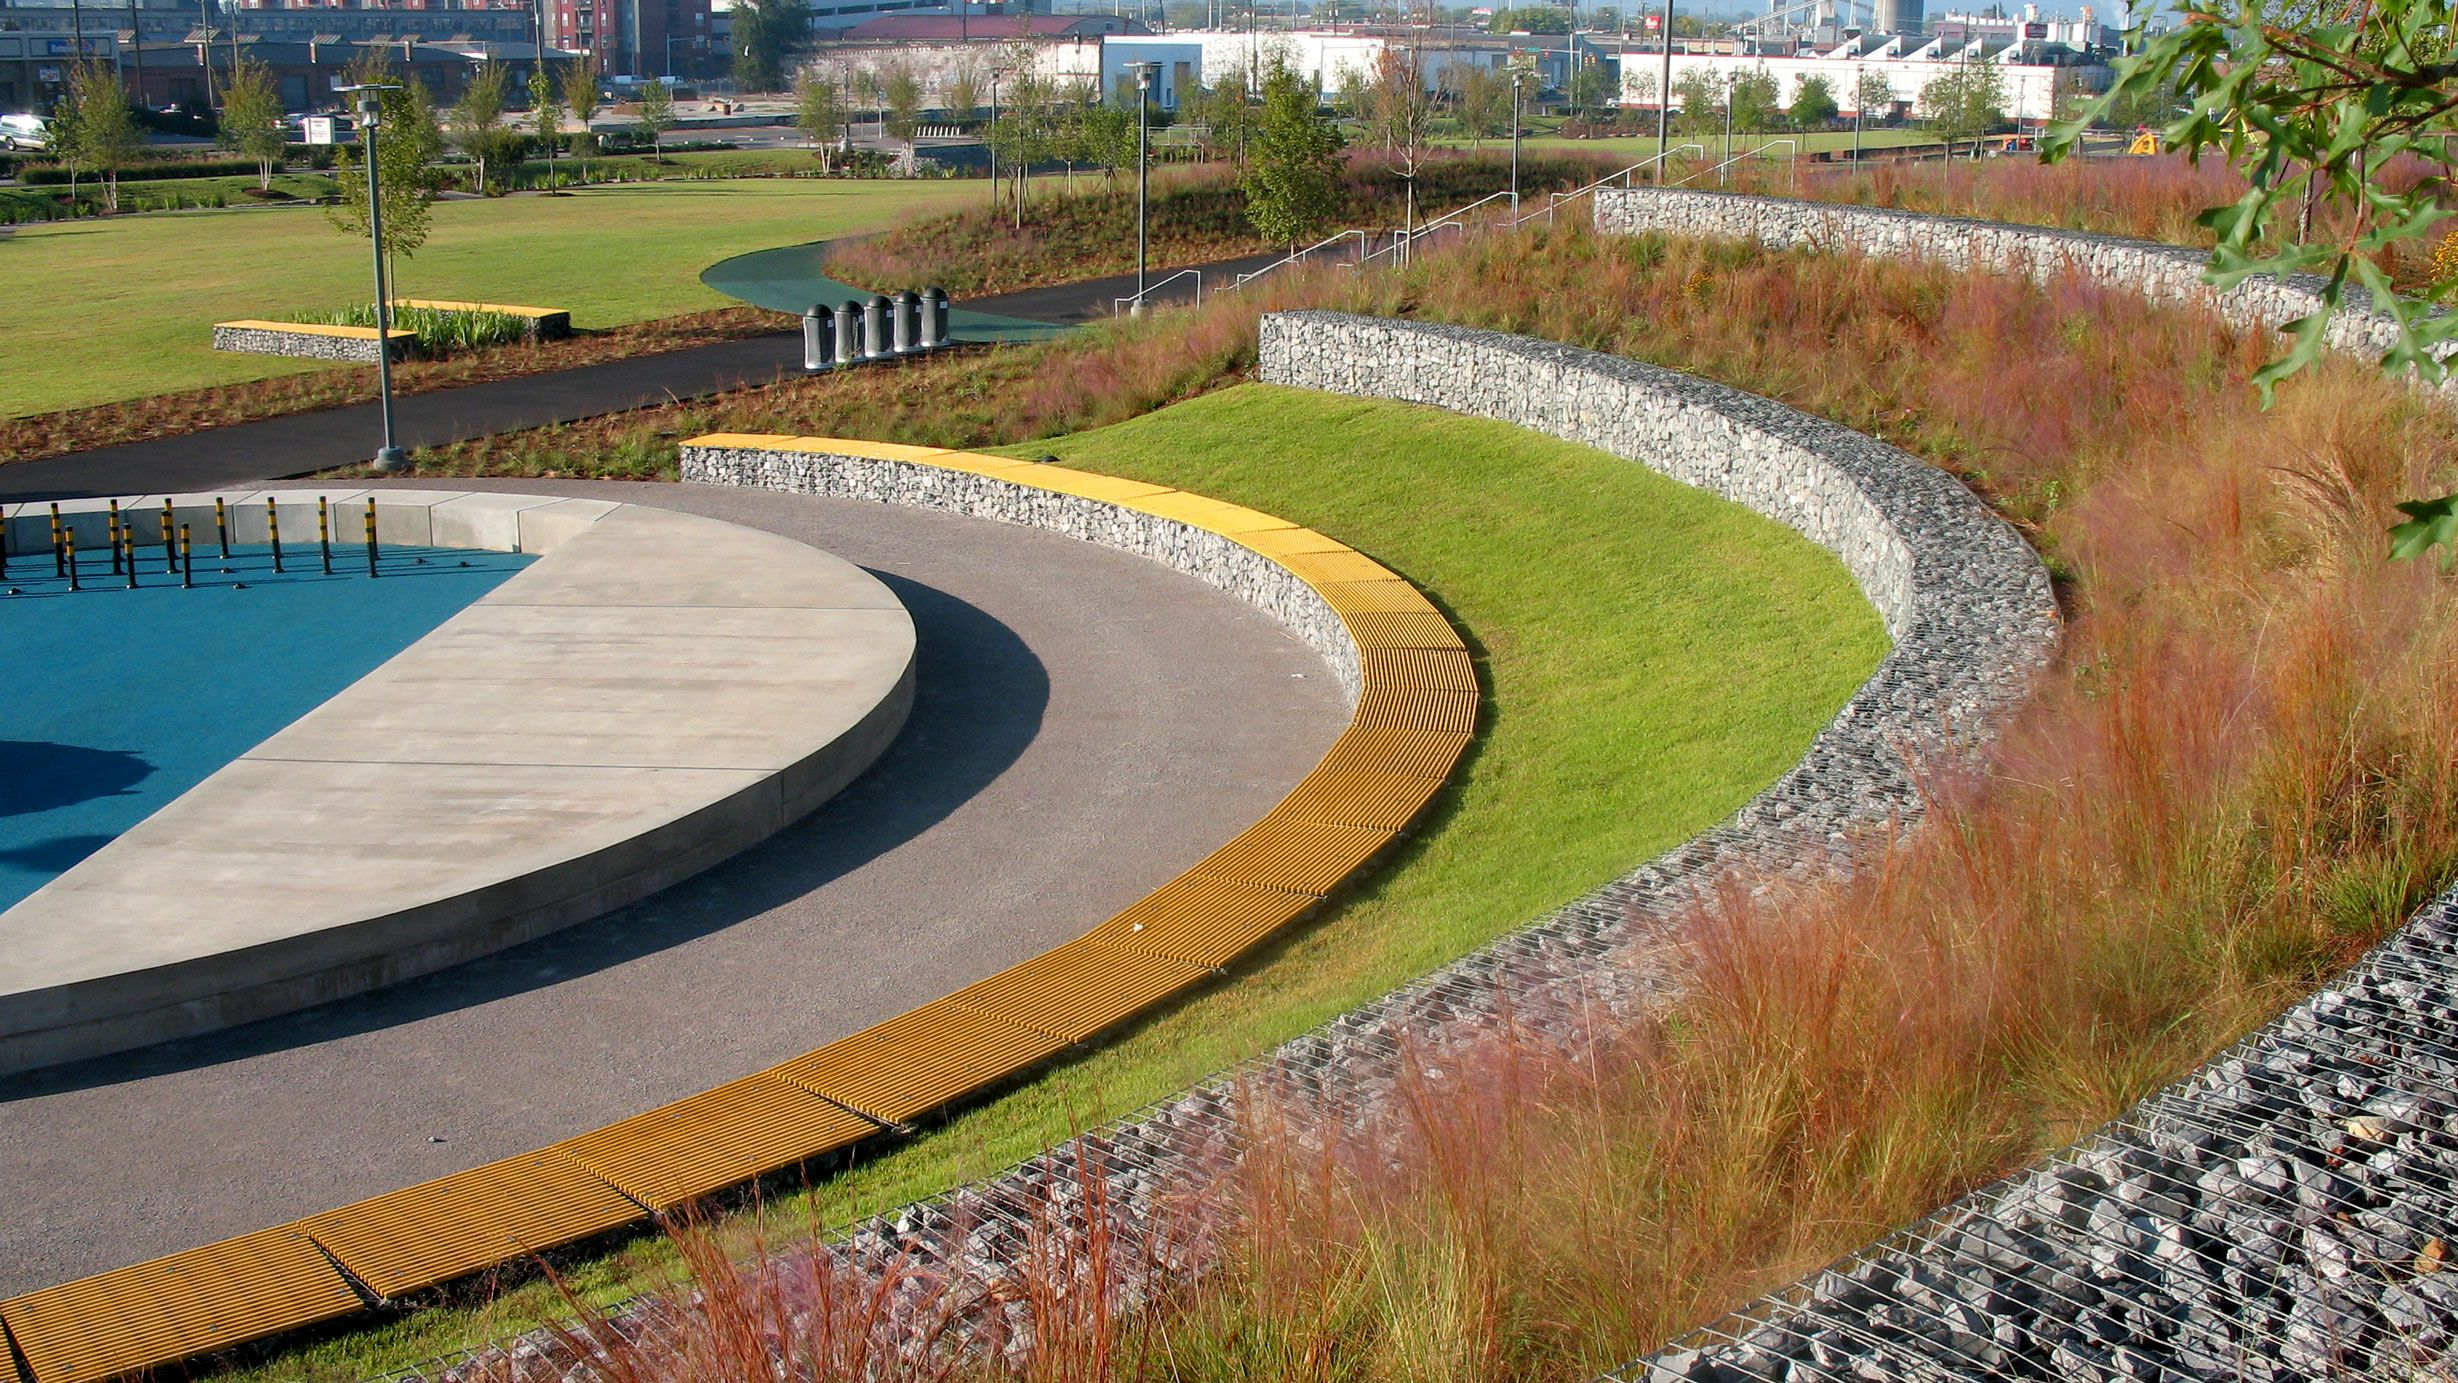 Railroad Park Tls Landscape Architecture Urban Landscape Design Landscape And Urbanism Landscape Architecture